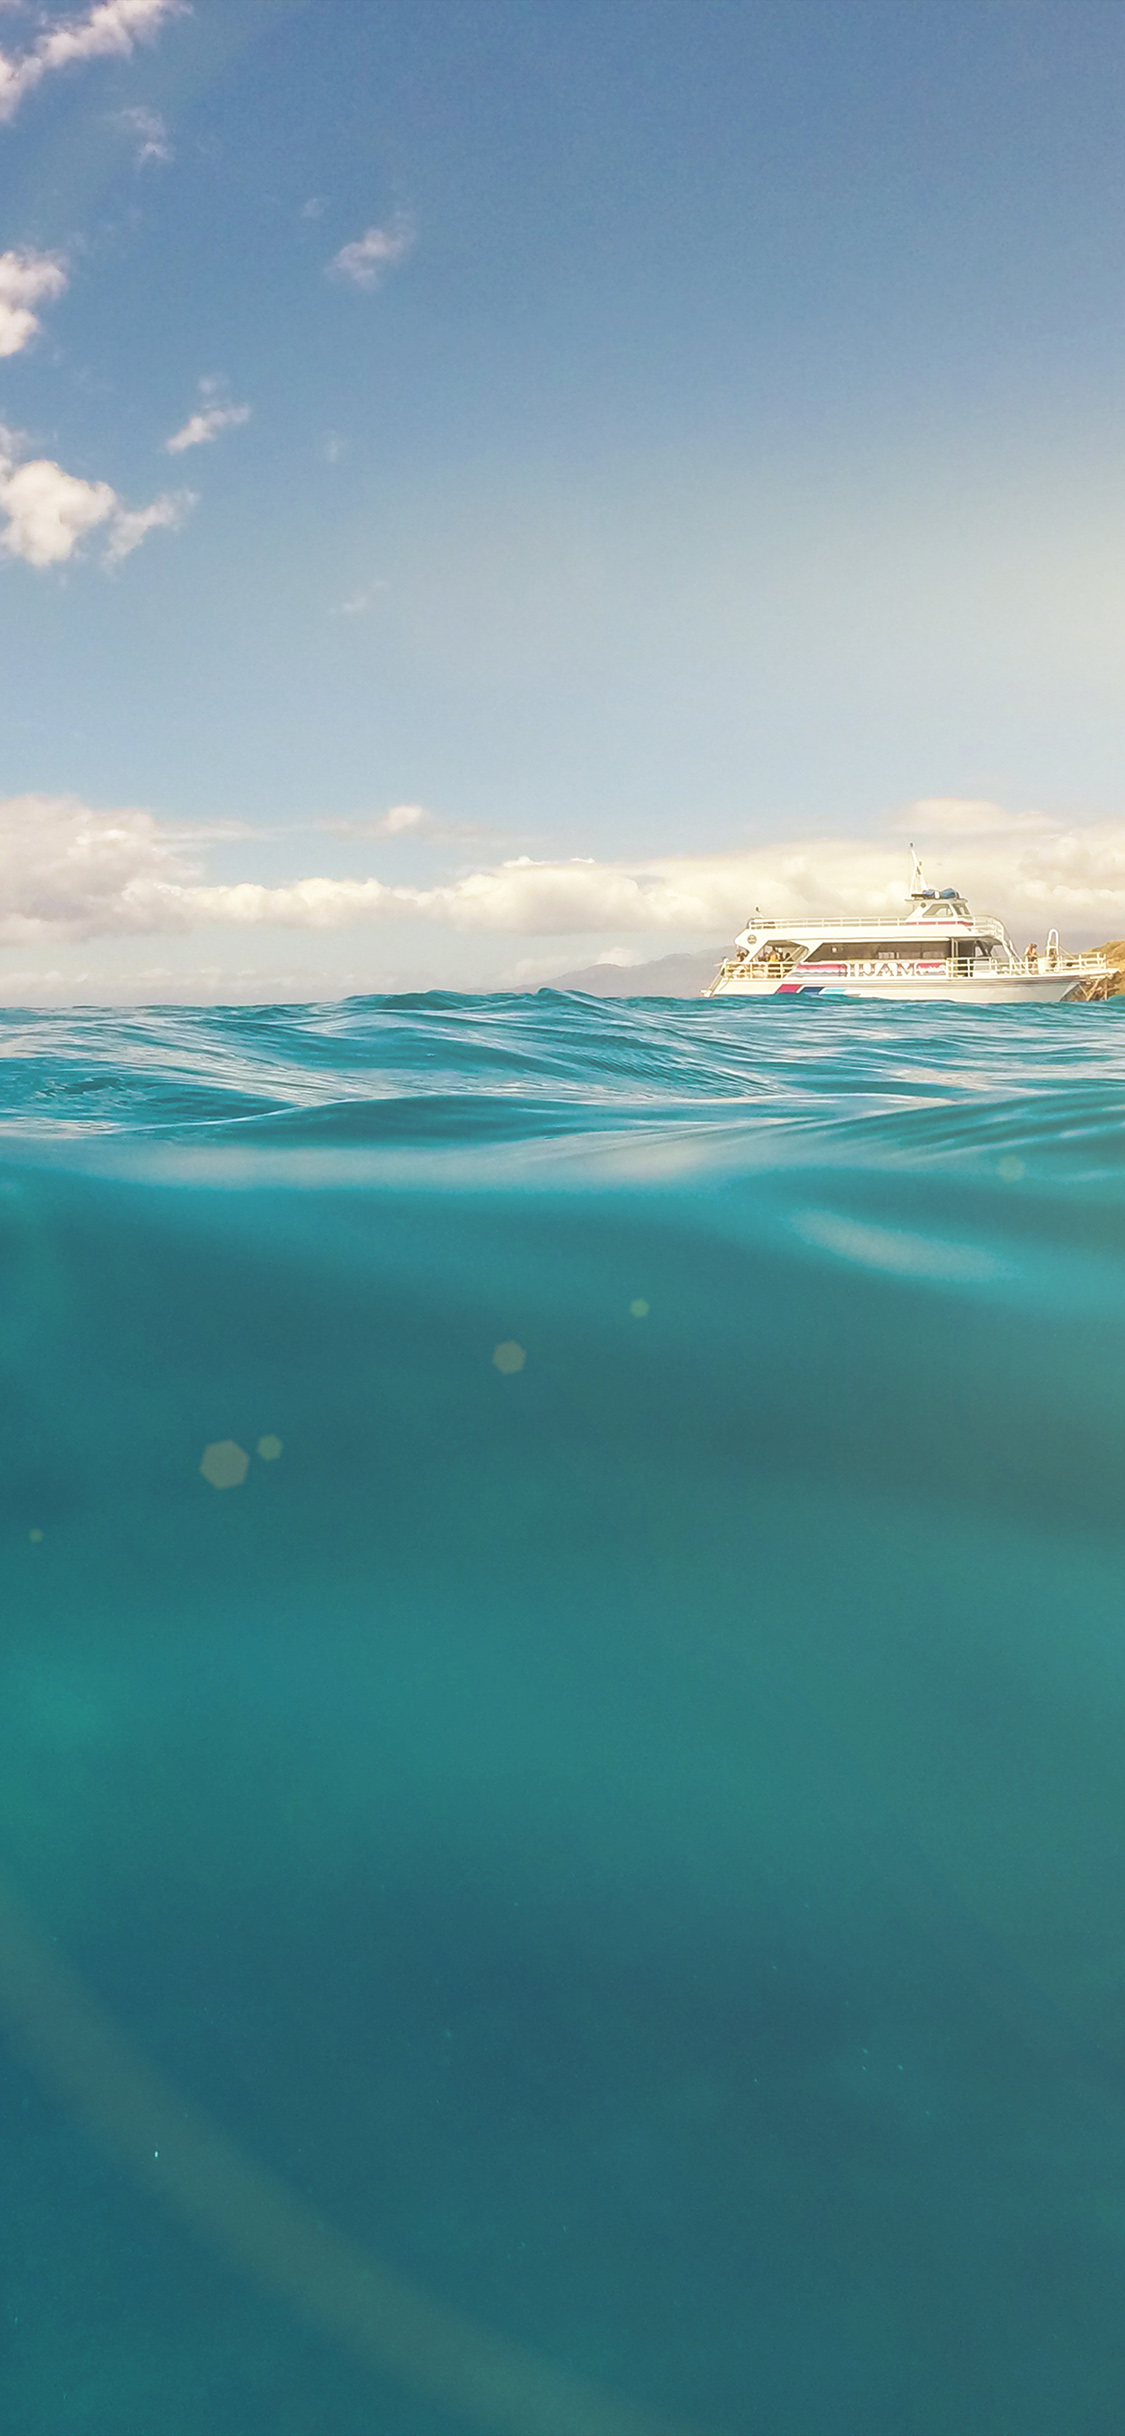 iPhonexpapers.com-Apple-iPhone-wallpaper-ni11-sea-ocean-boat-summer-vacation-blue-green-flare